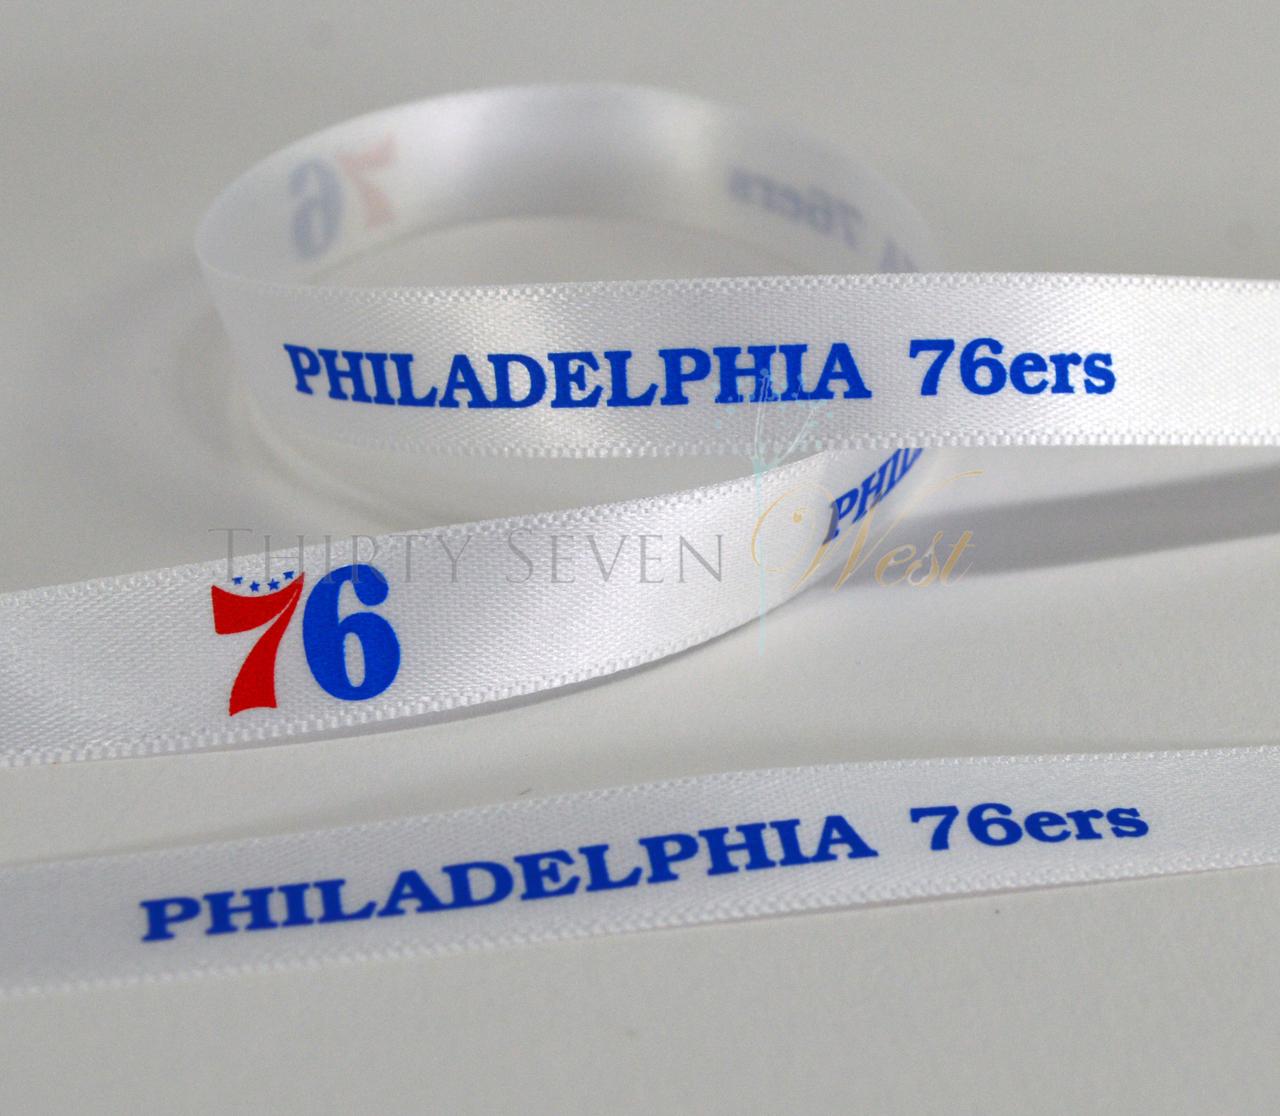 Custom Multi Color Logo Ribbon, Full Color Logo Ribbon, 2 Color Logo Ribbon, Two Color Logo Ribbon, Pantone Color Logo Ribbon, PMS Color Logo Ribbon, Multi Color Custom Ribbon, Philadelphia 76ers